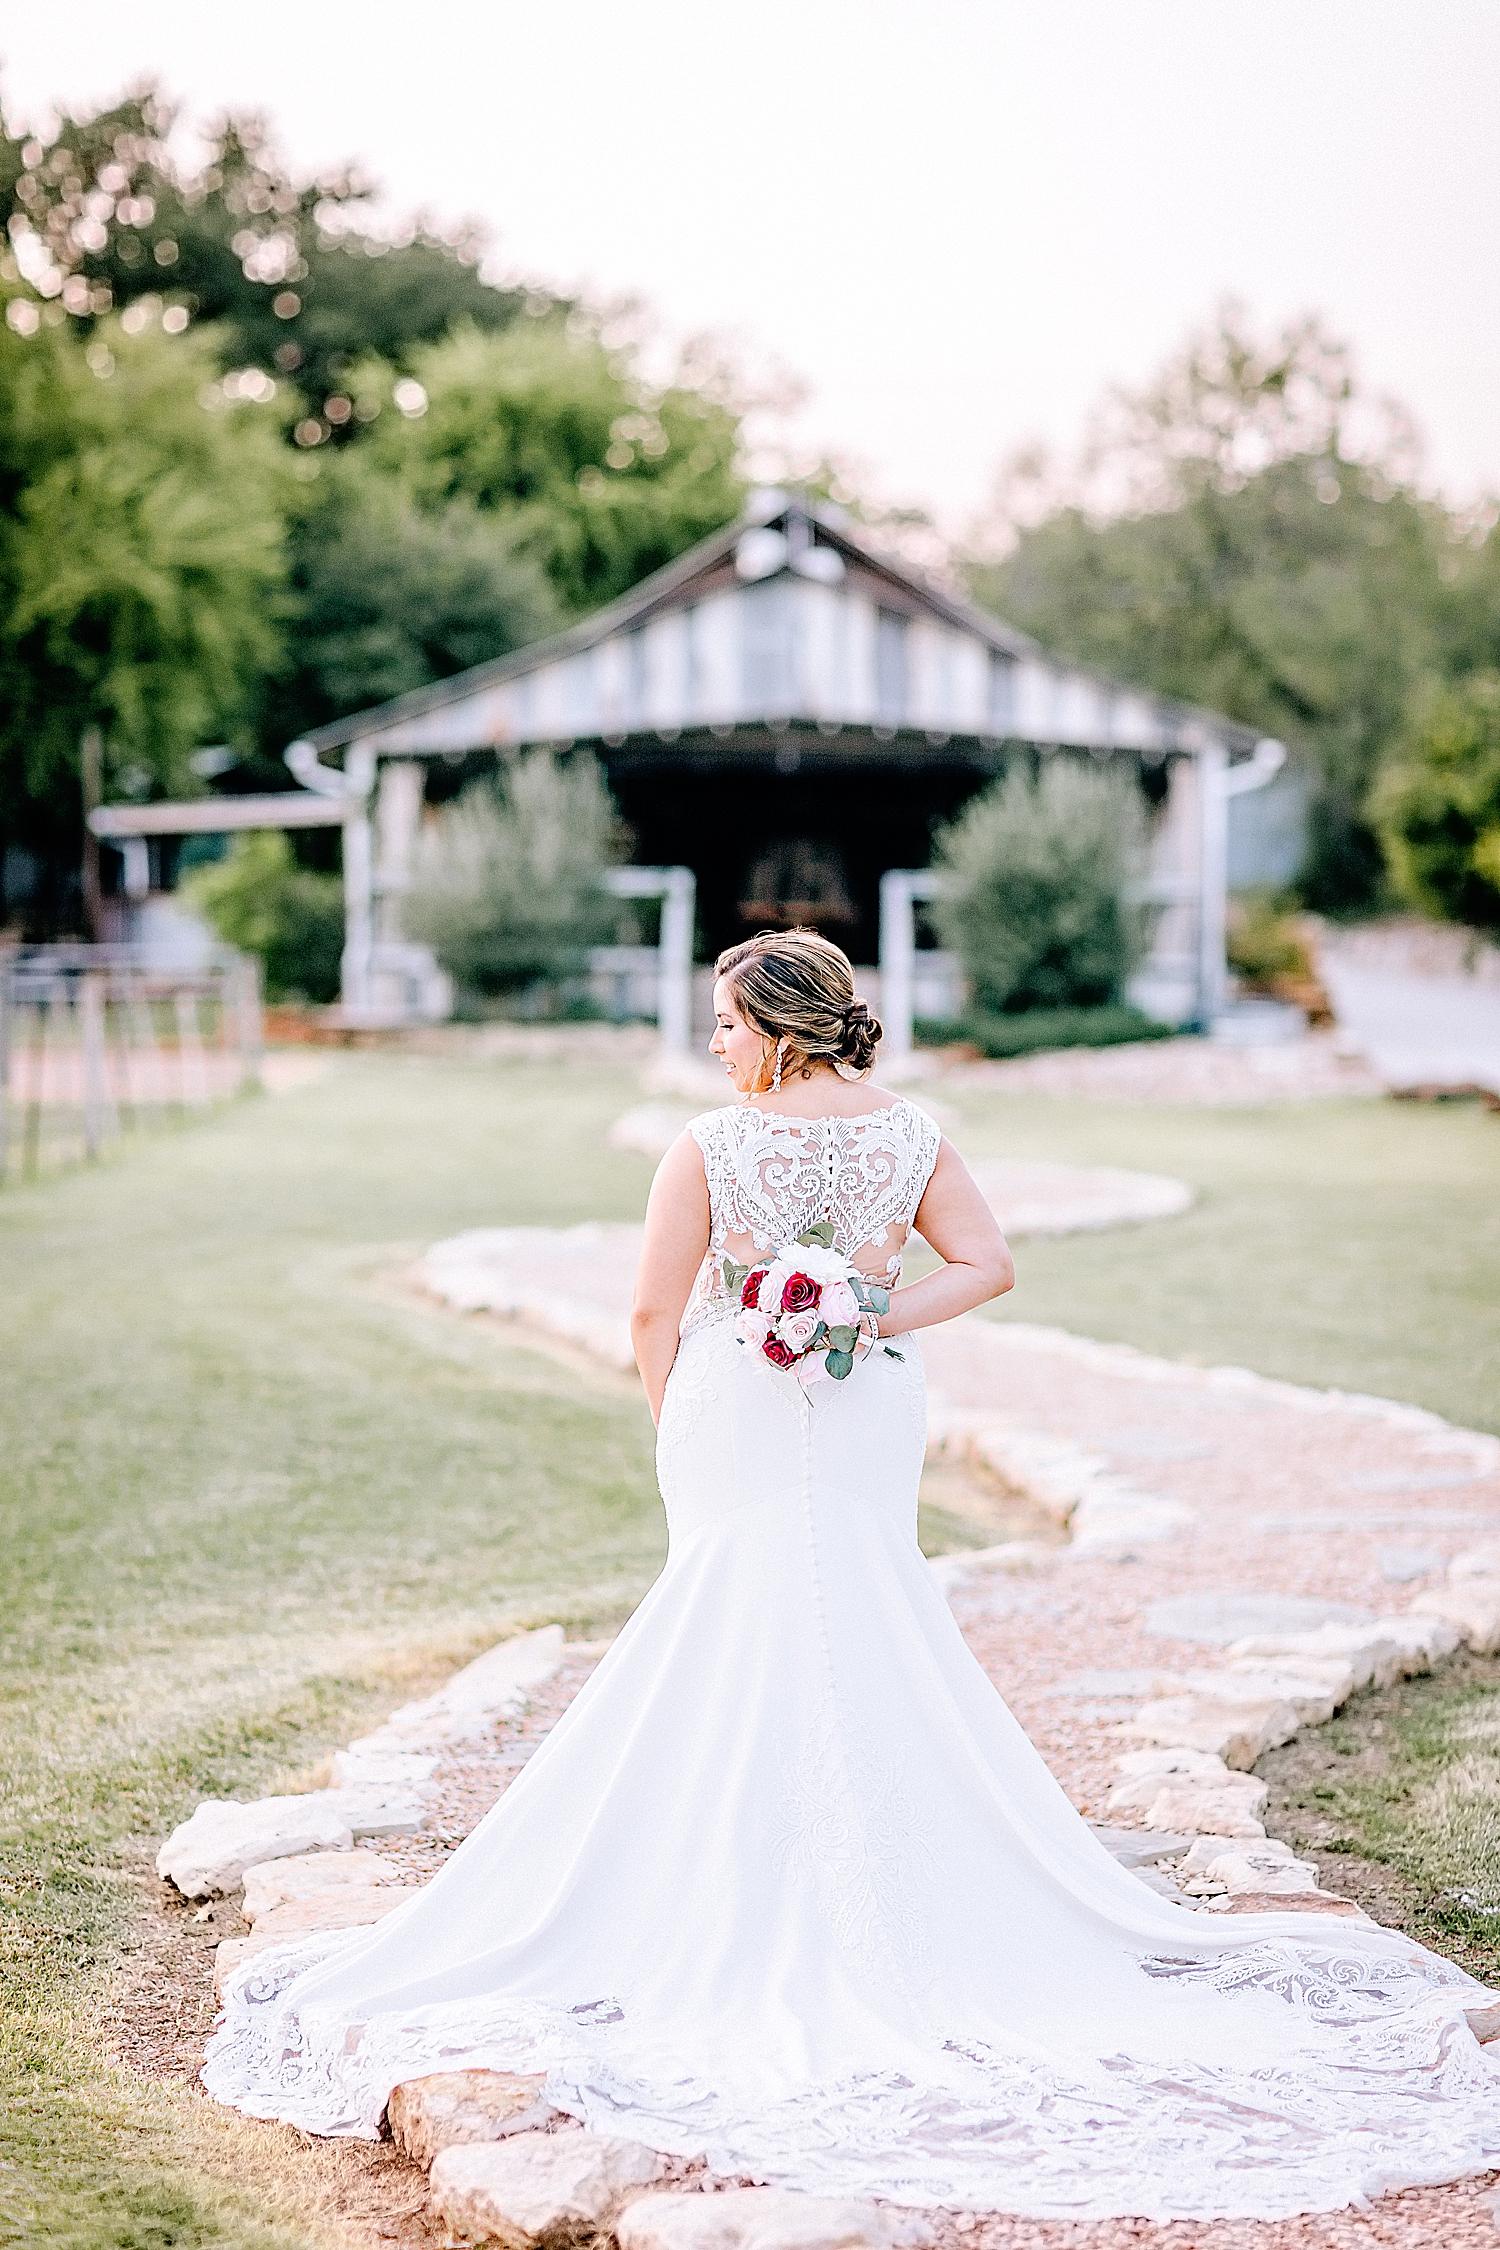 Carly-Barton-Photography-Gruene-Estate-Wedding-Photographer-New-Braunfels-Texas-Bridal-Session_0025.jpg